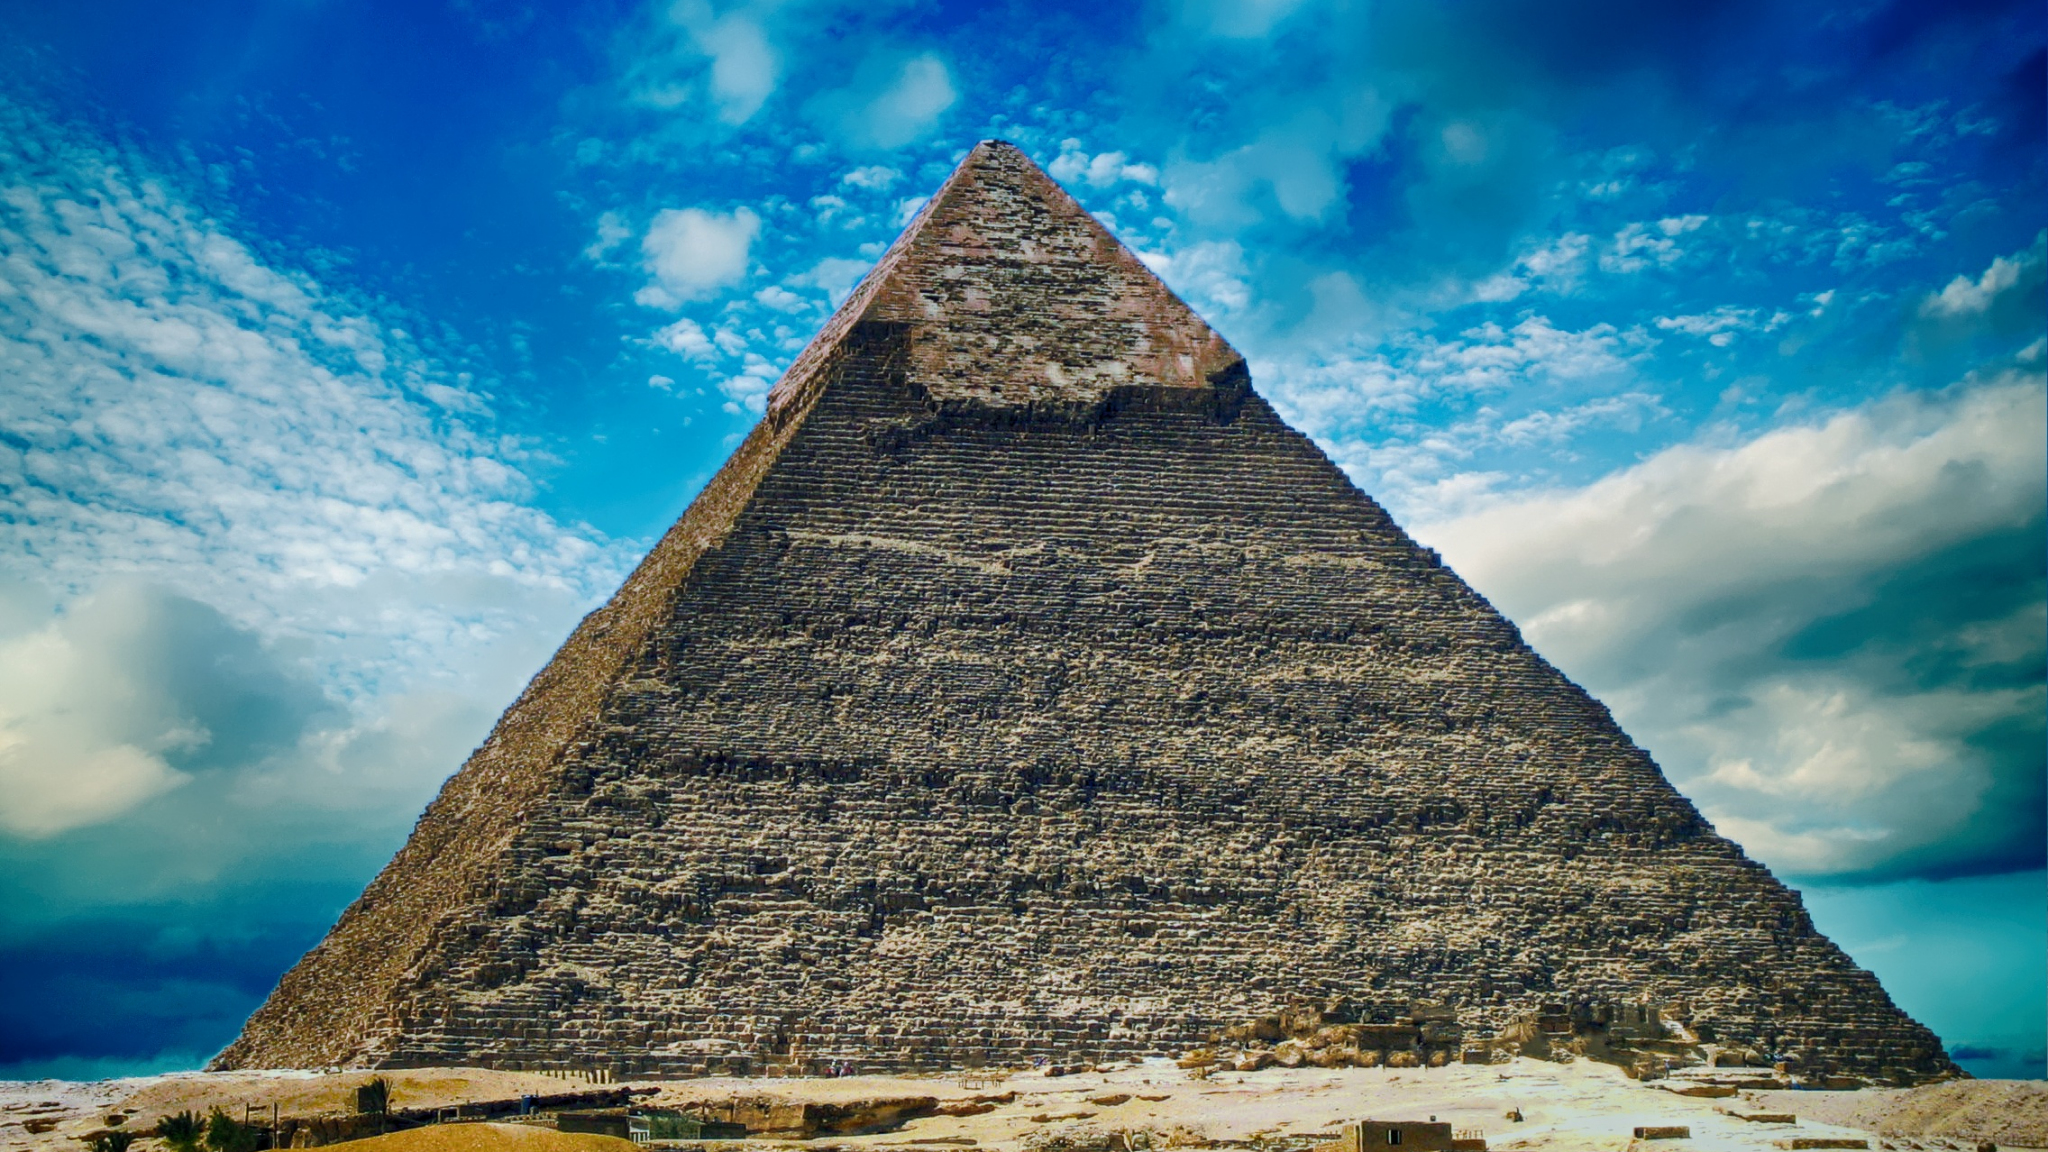 Download 2048x1152 Wallpaper Pyramid, Giza Pyramids, Desert, Ancient